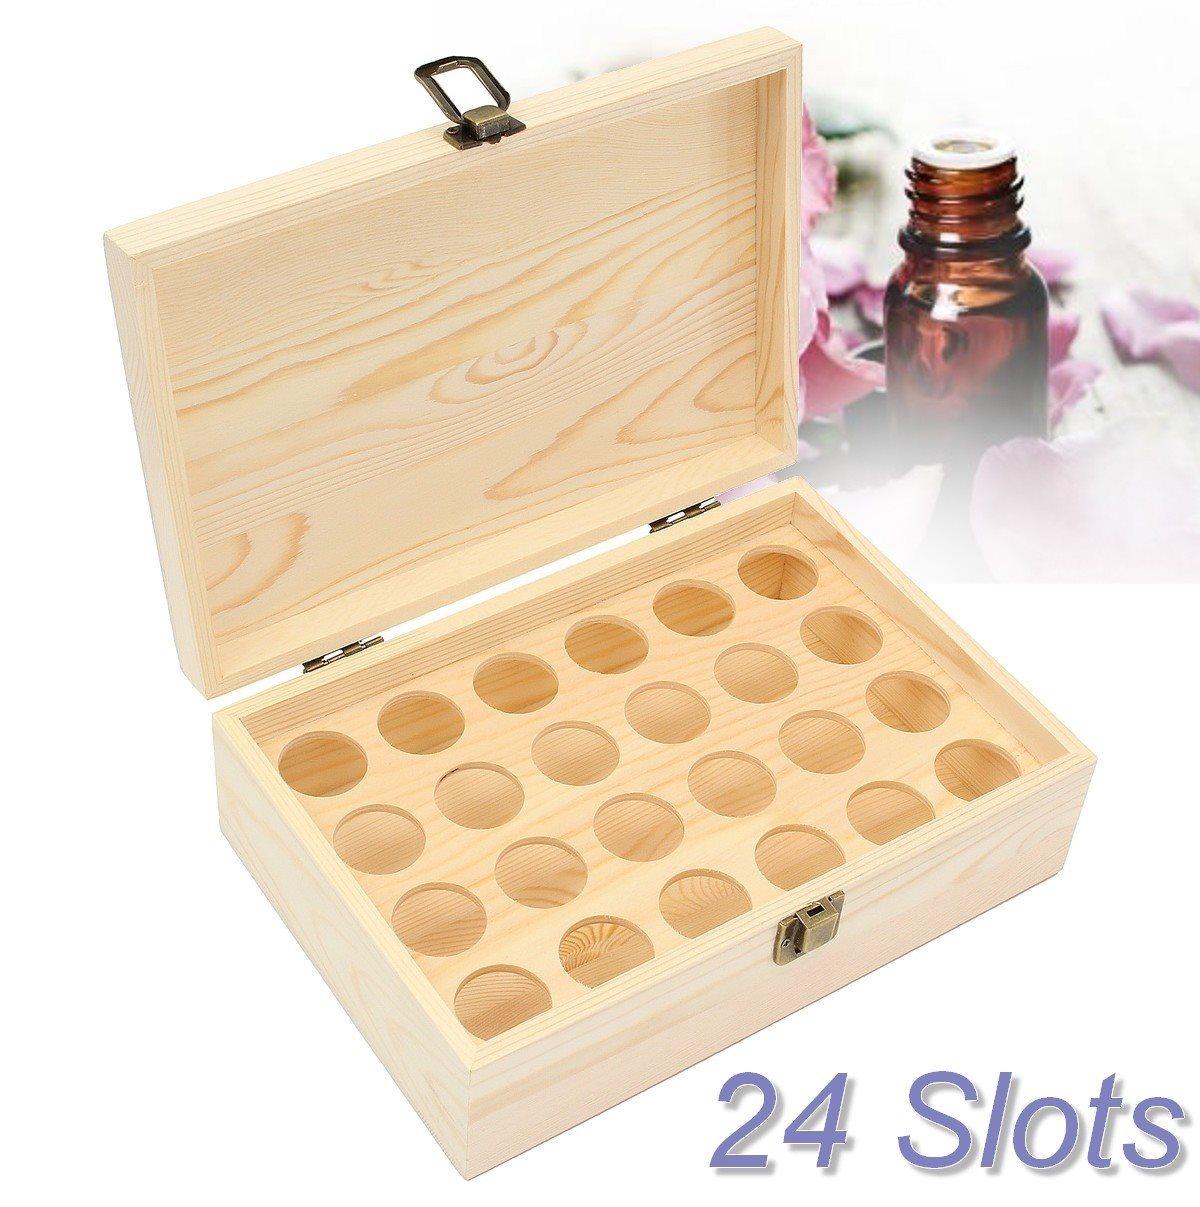 50pcs Lot Paper Arts Craft Decorative Supply Big And Small Circles House Shape Wedding Candy Box Bride Gift Portable Case